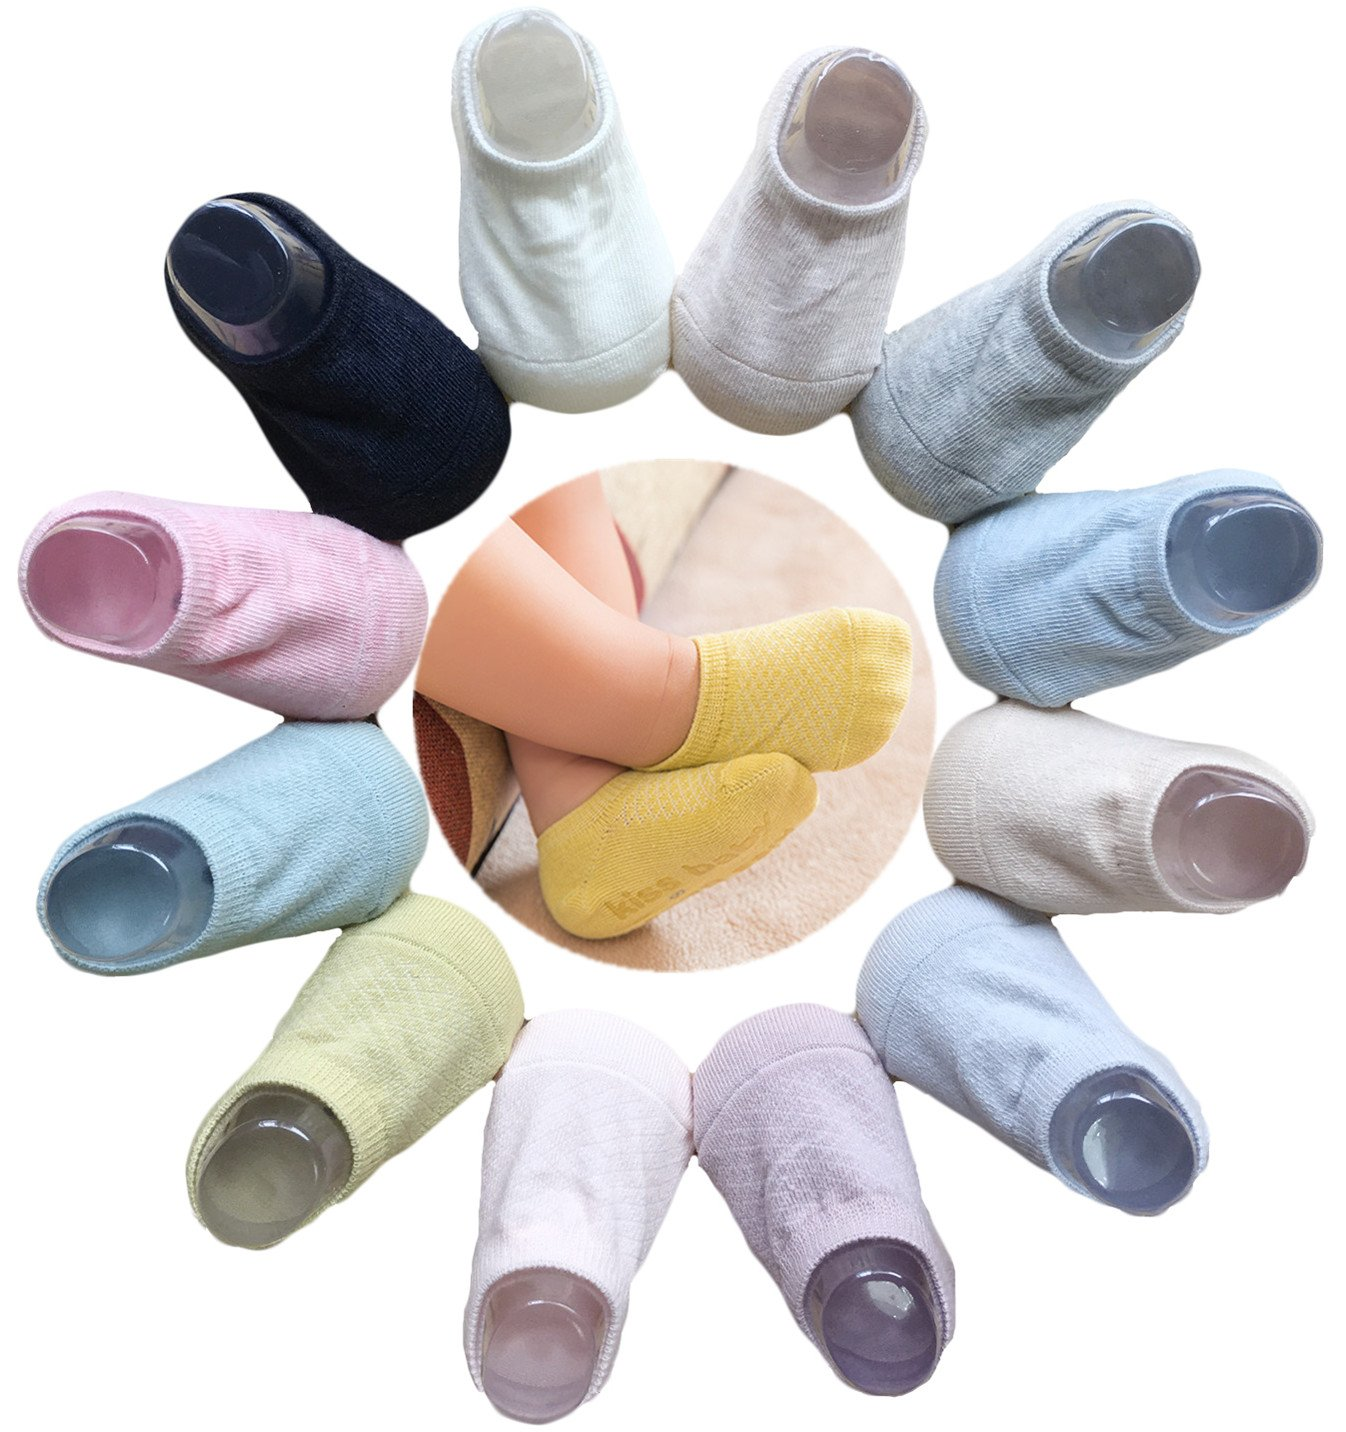 QandSweat Unisex Baby Anti Slip Foot Socks Toddler Non-skid Socks for Boy Girl and kids (12 Colors, 1-3T)